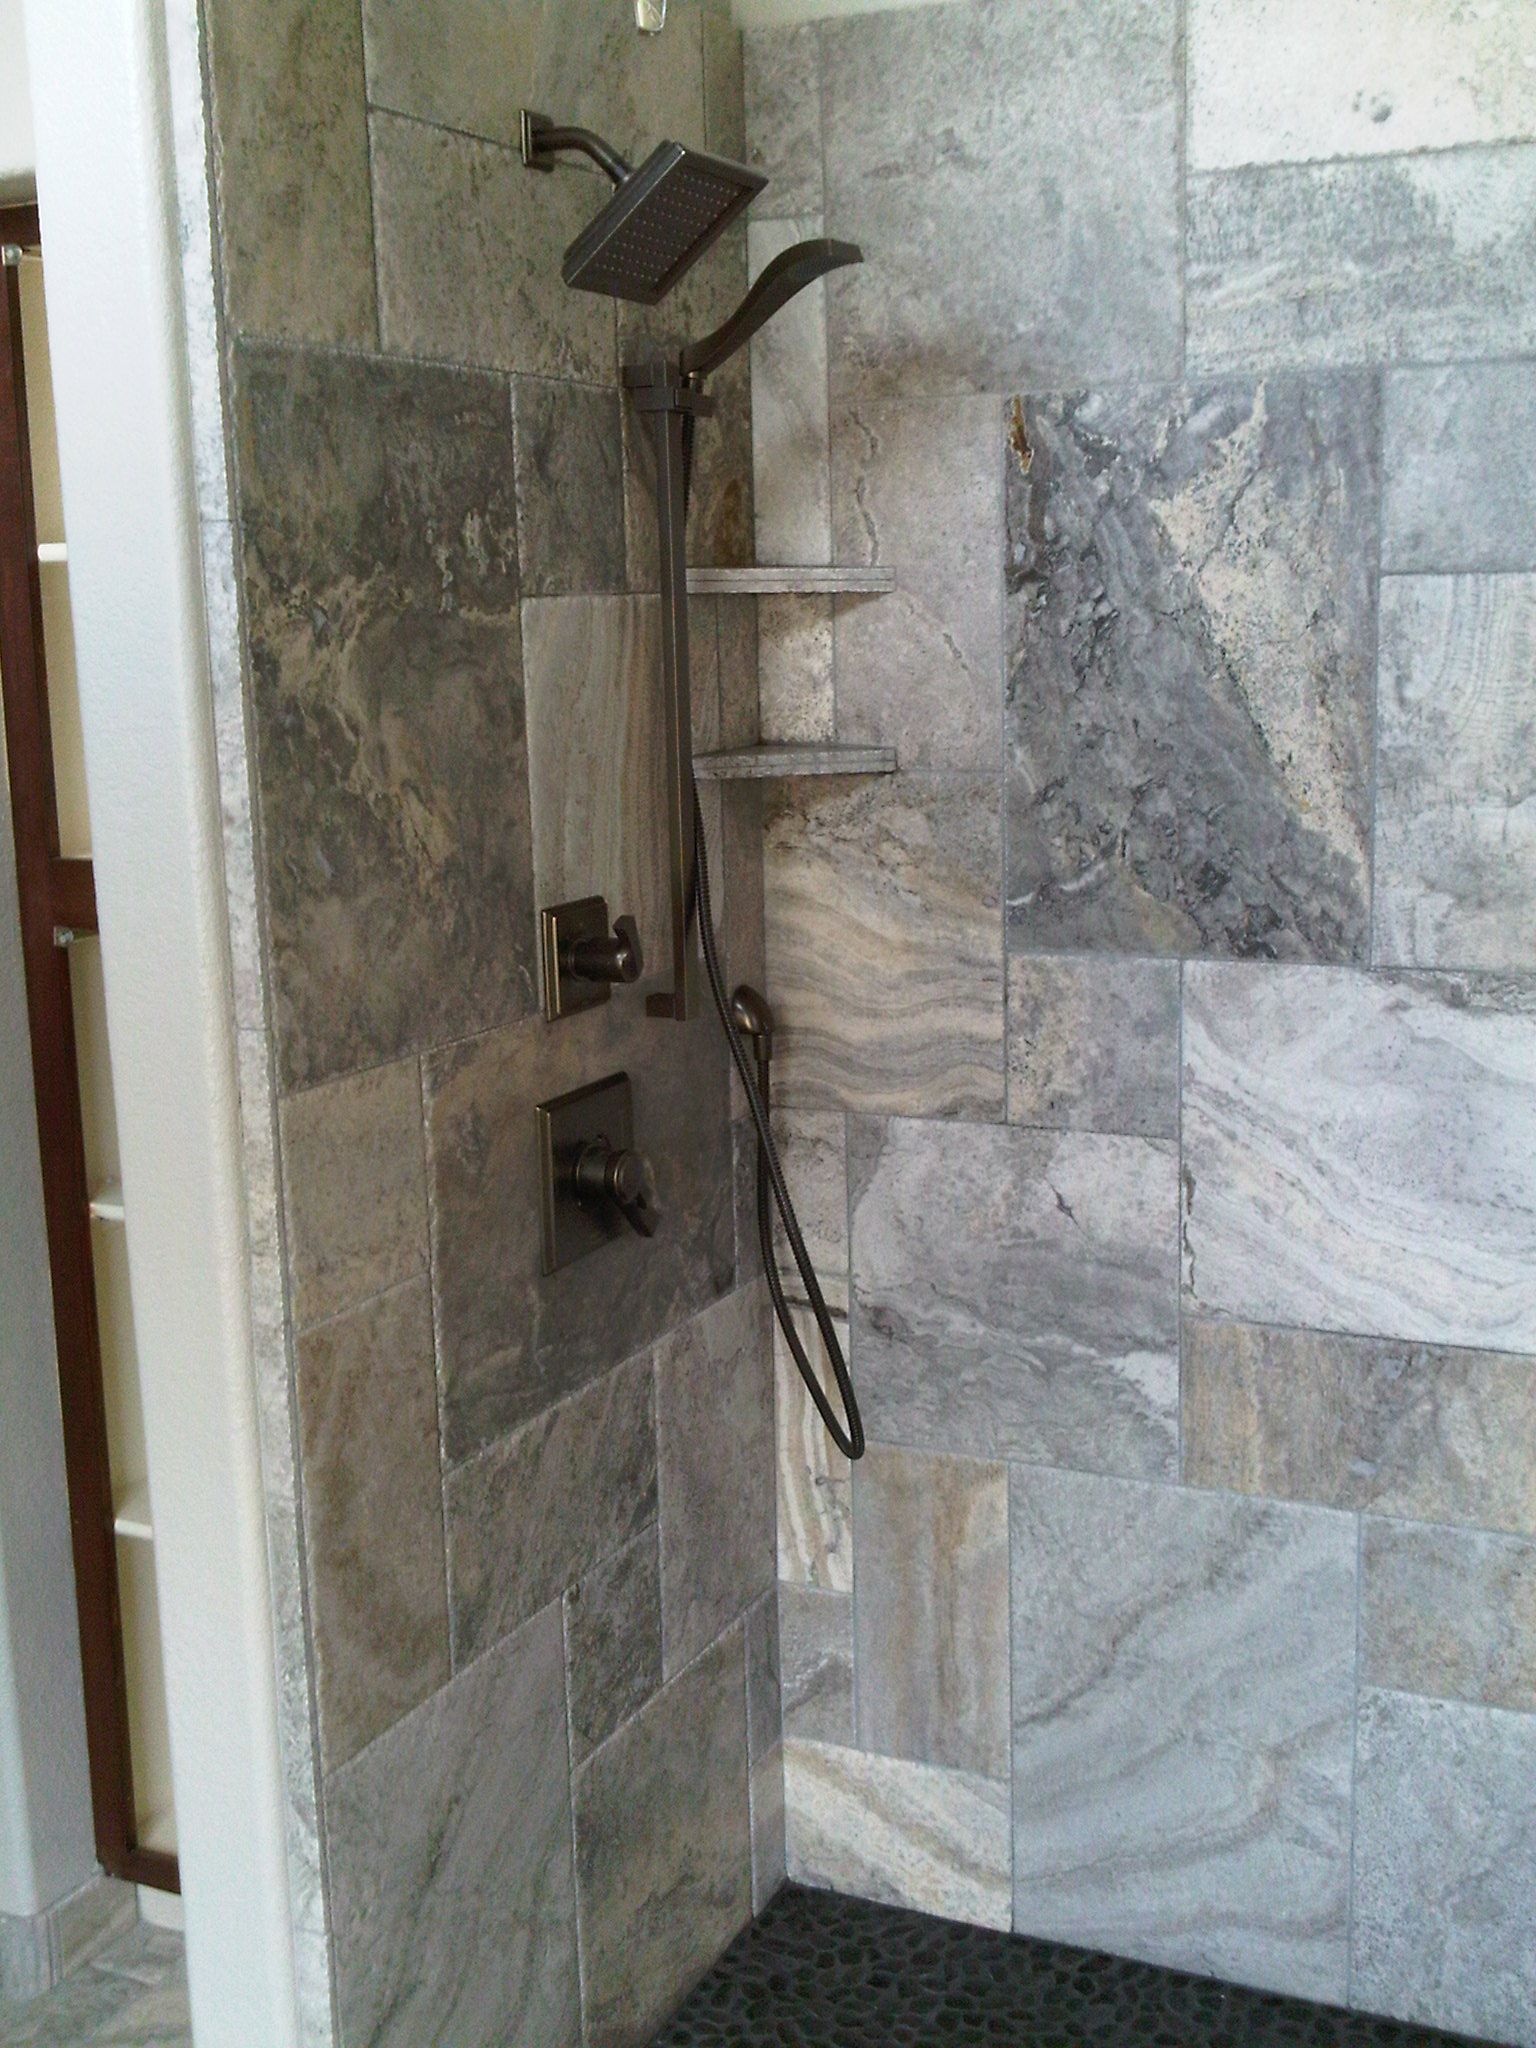 Silver Travertine in the shower | Bathrooms | Pinterest ...